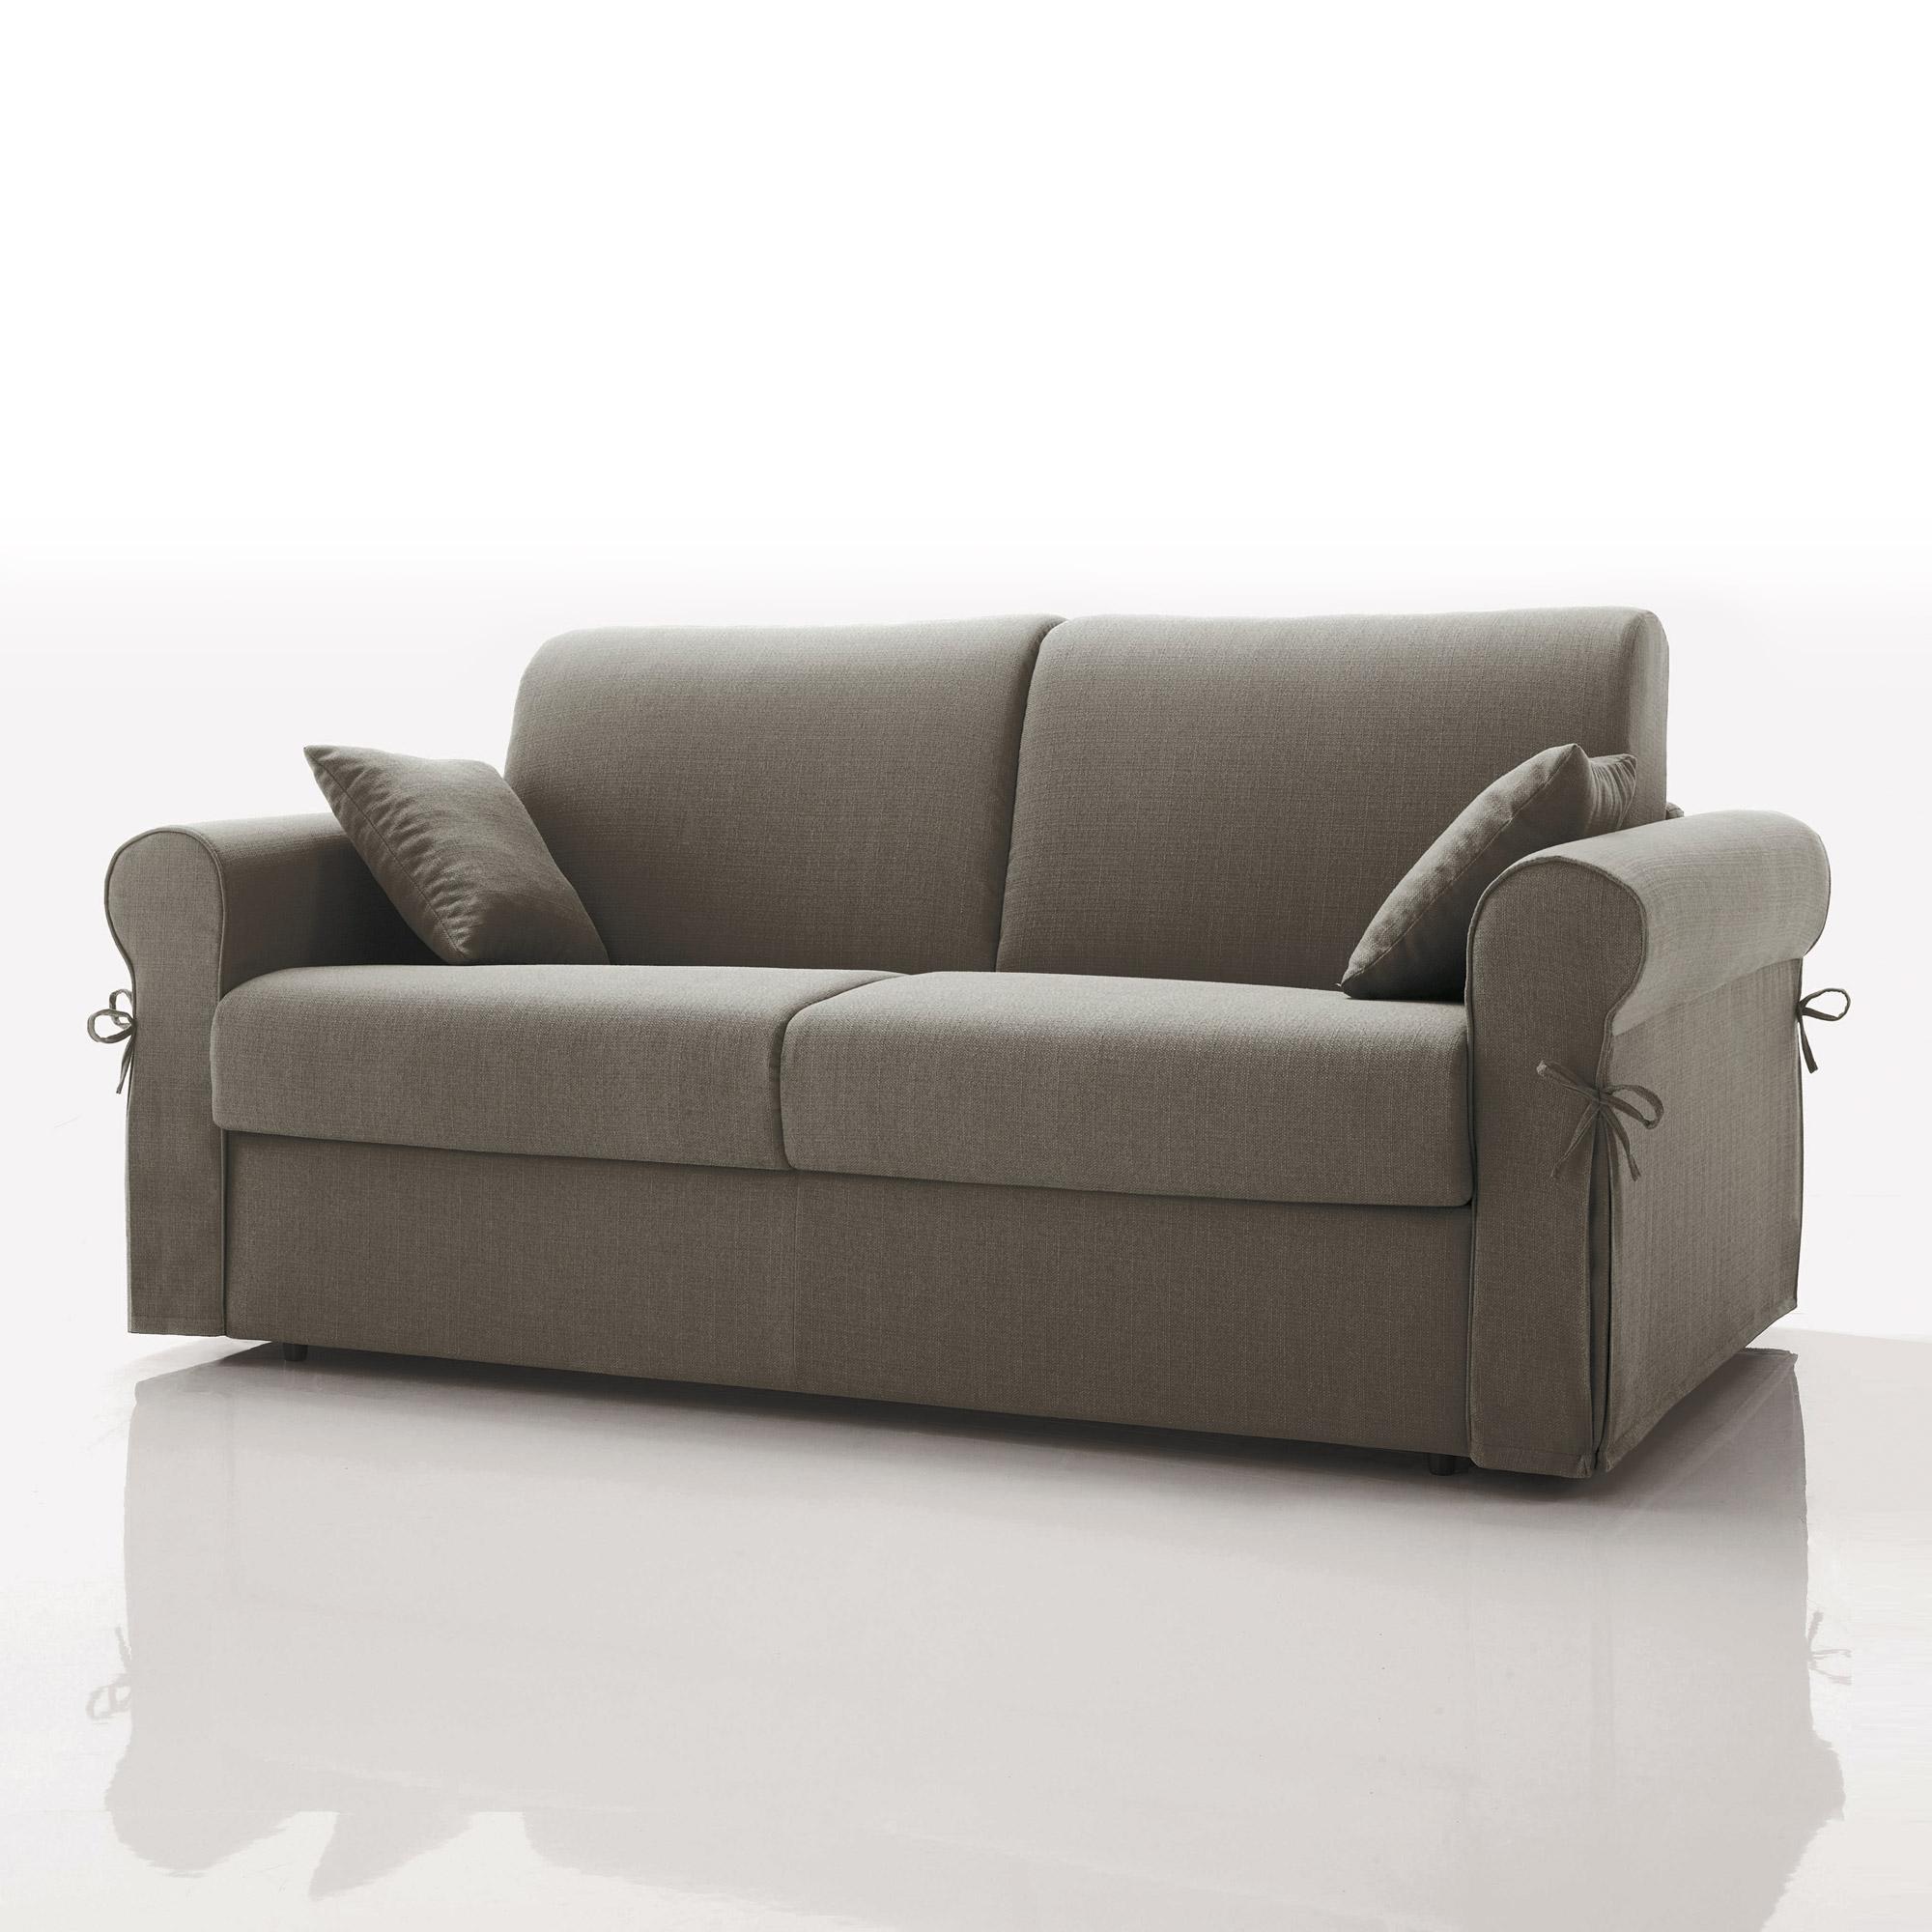 canap convertible 3 places tissu d houssable gris ebay. Black Bedroom Furniture Sets. Home Design Ideas